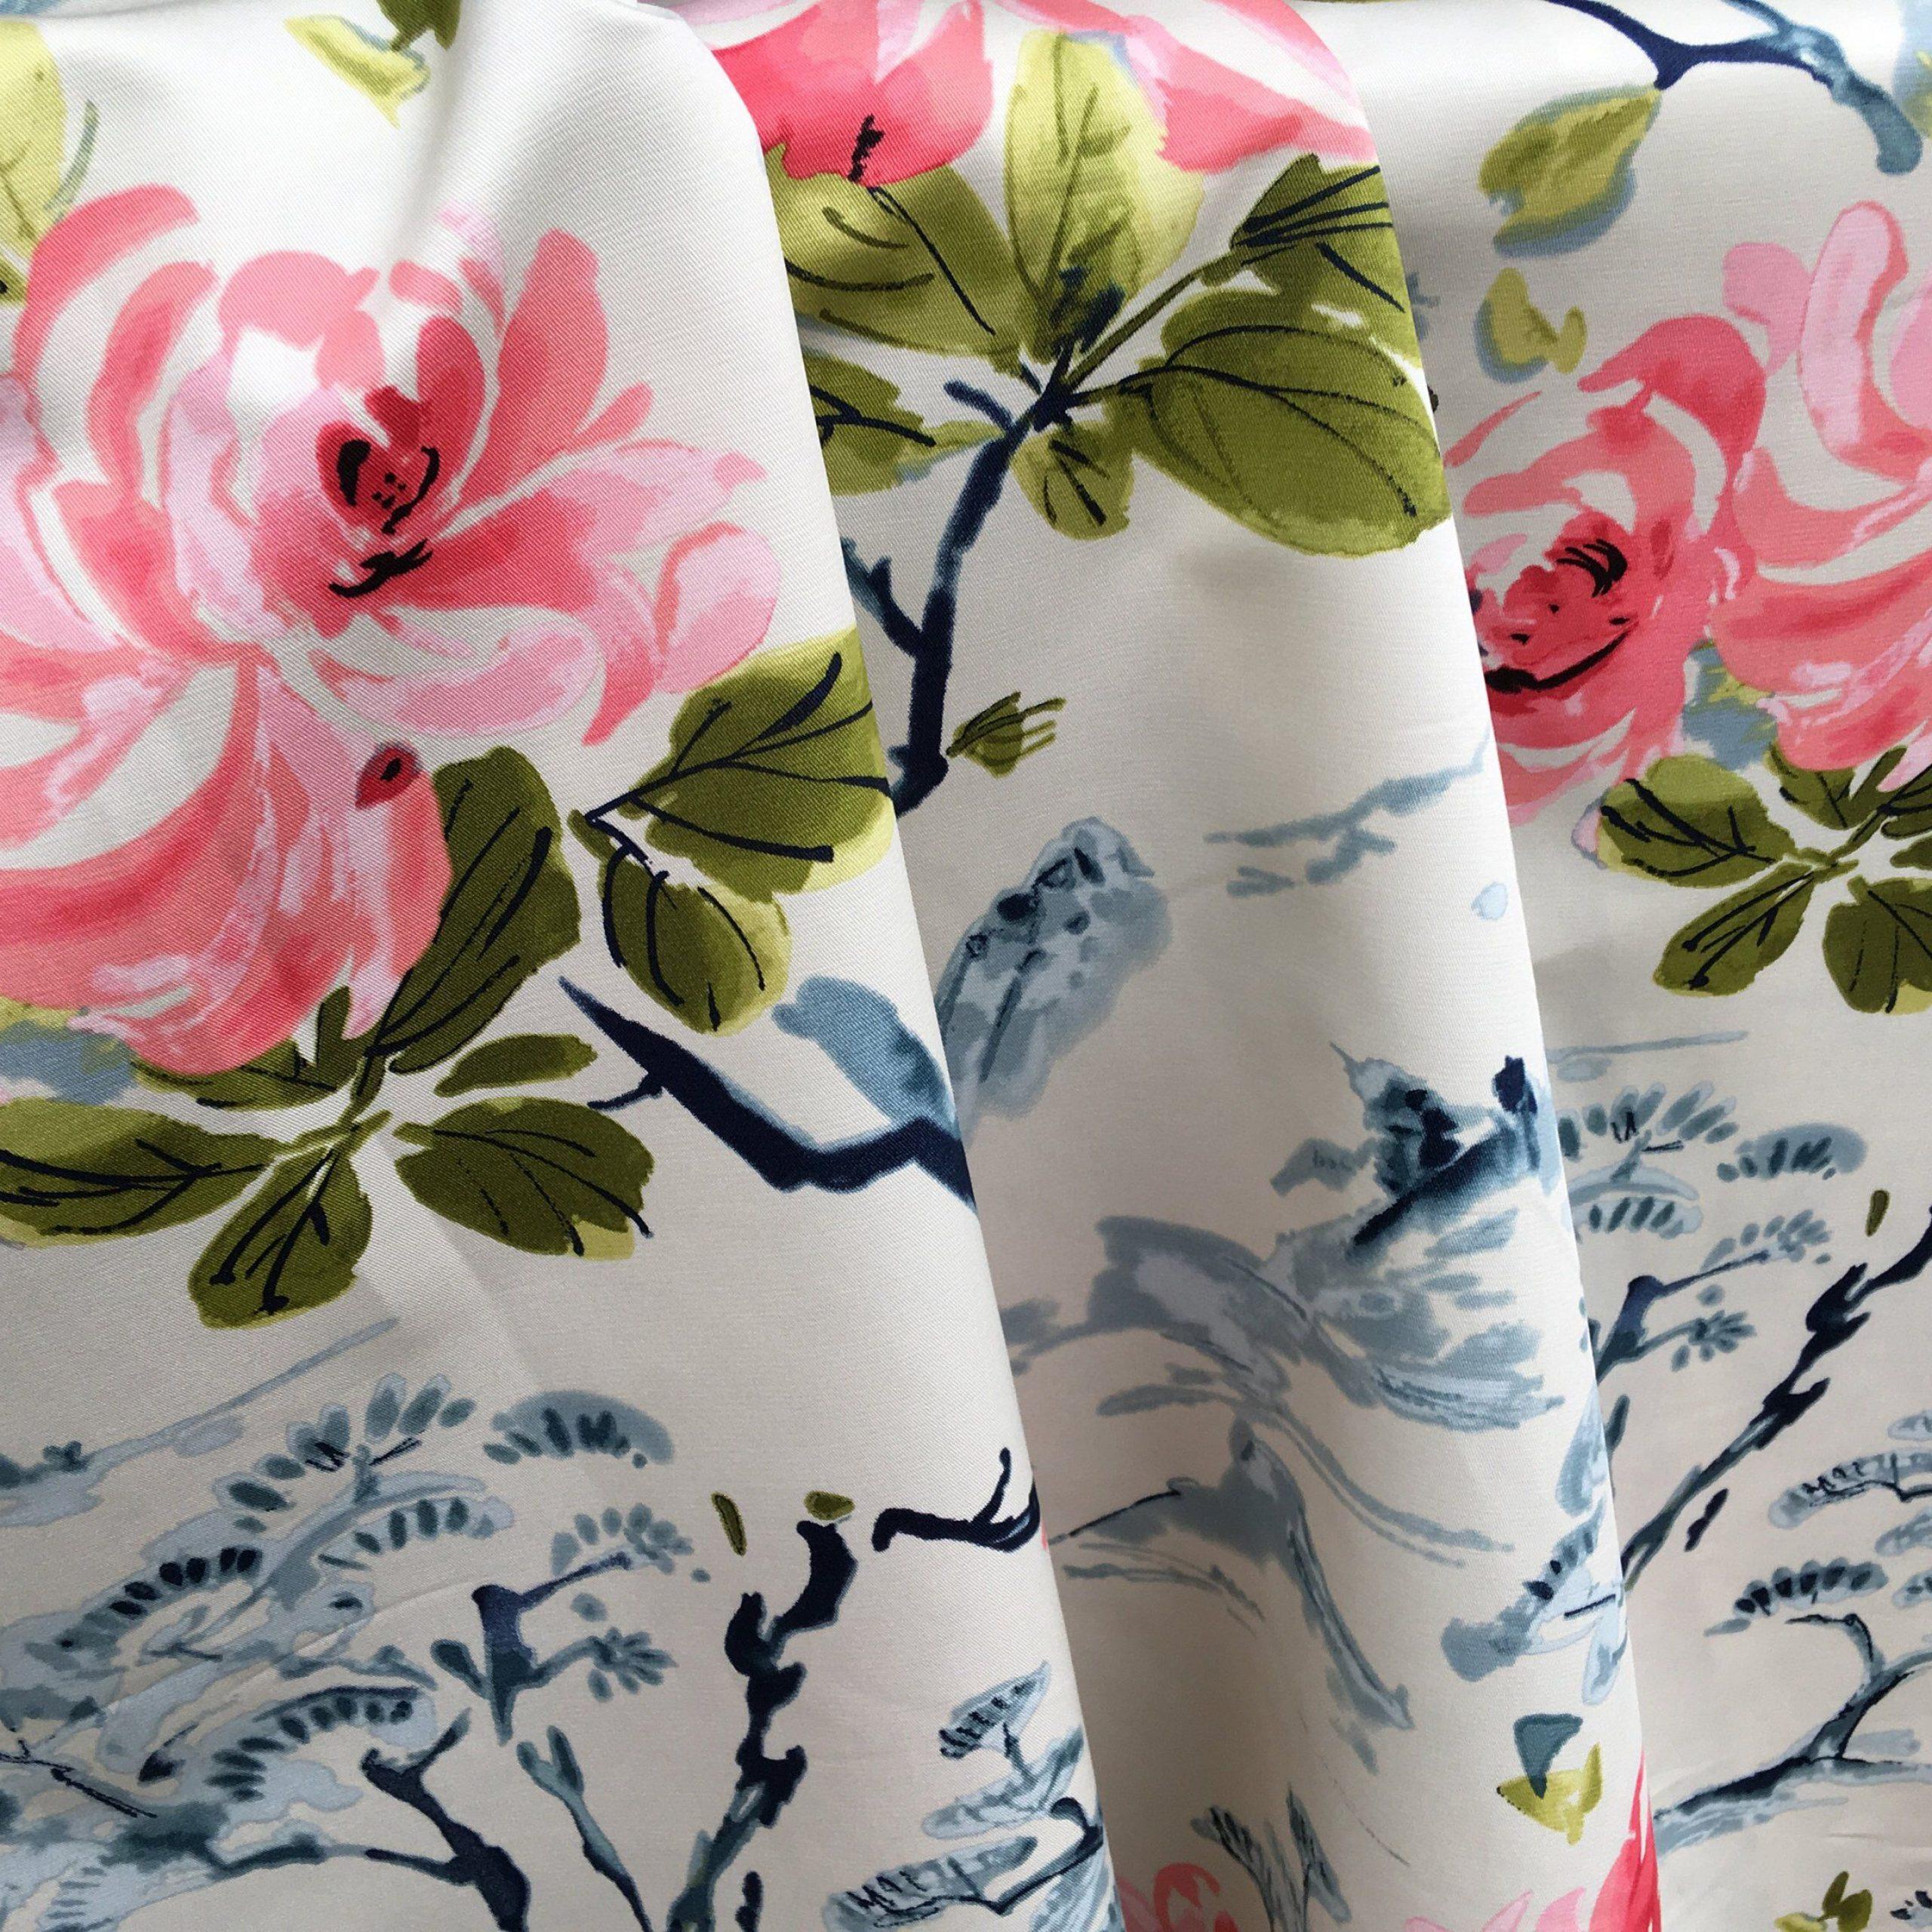 Asian Chintz Upholstery Fabricthe Yard / Chinoiserie Pertaining To Chintz Fabric Sofas (View 13 of 15)